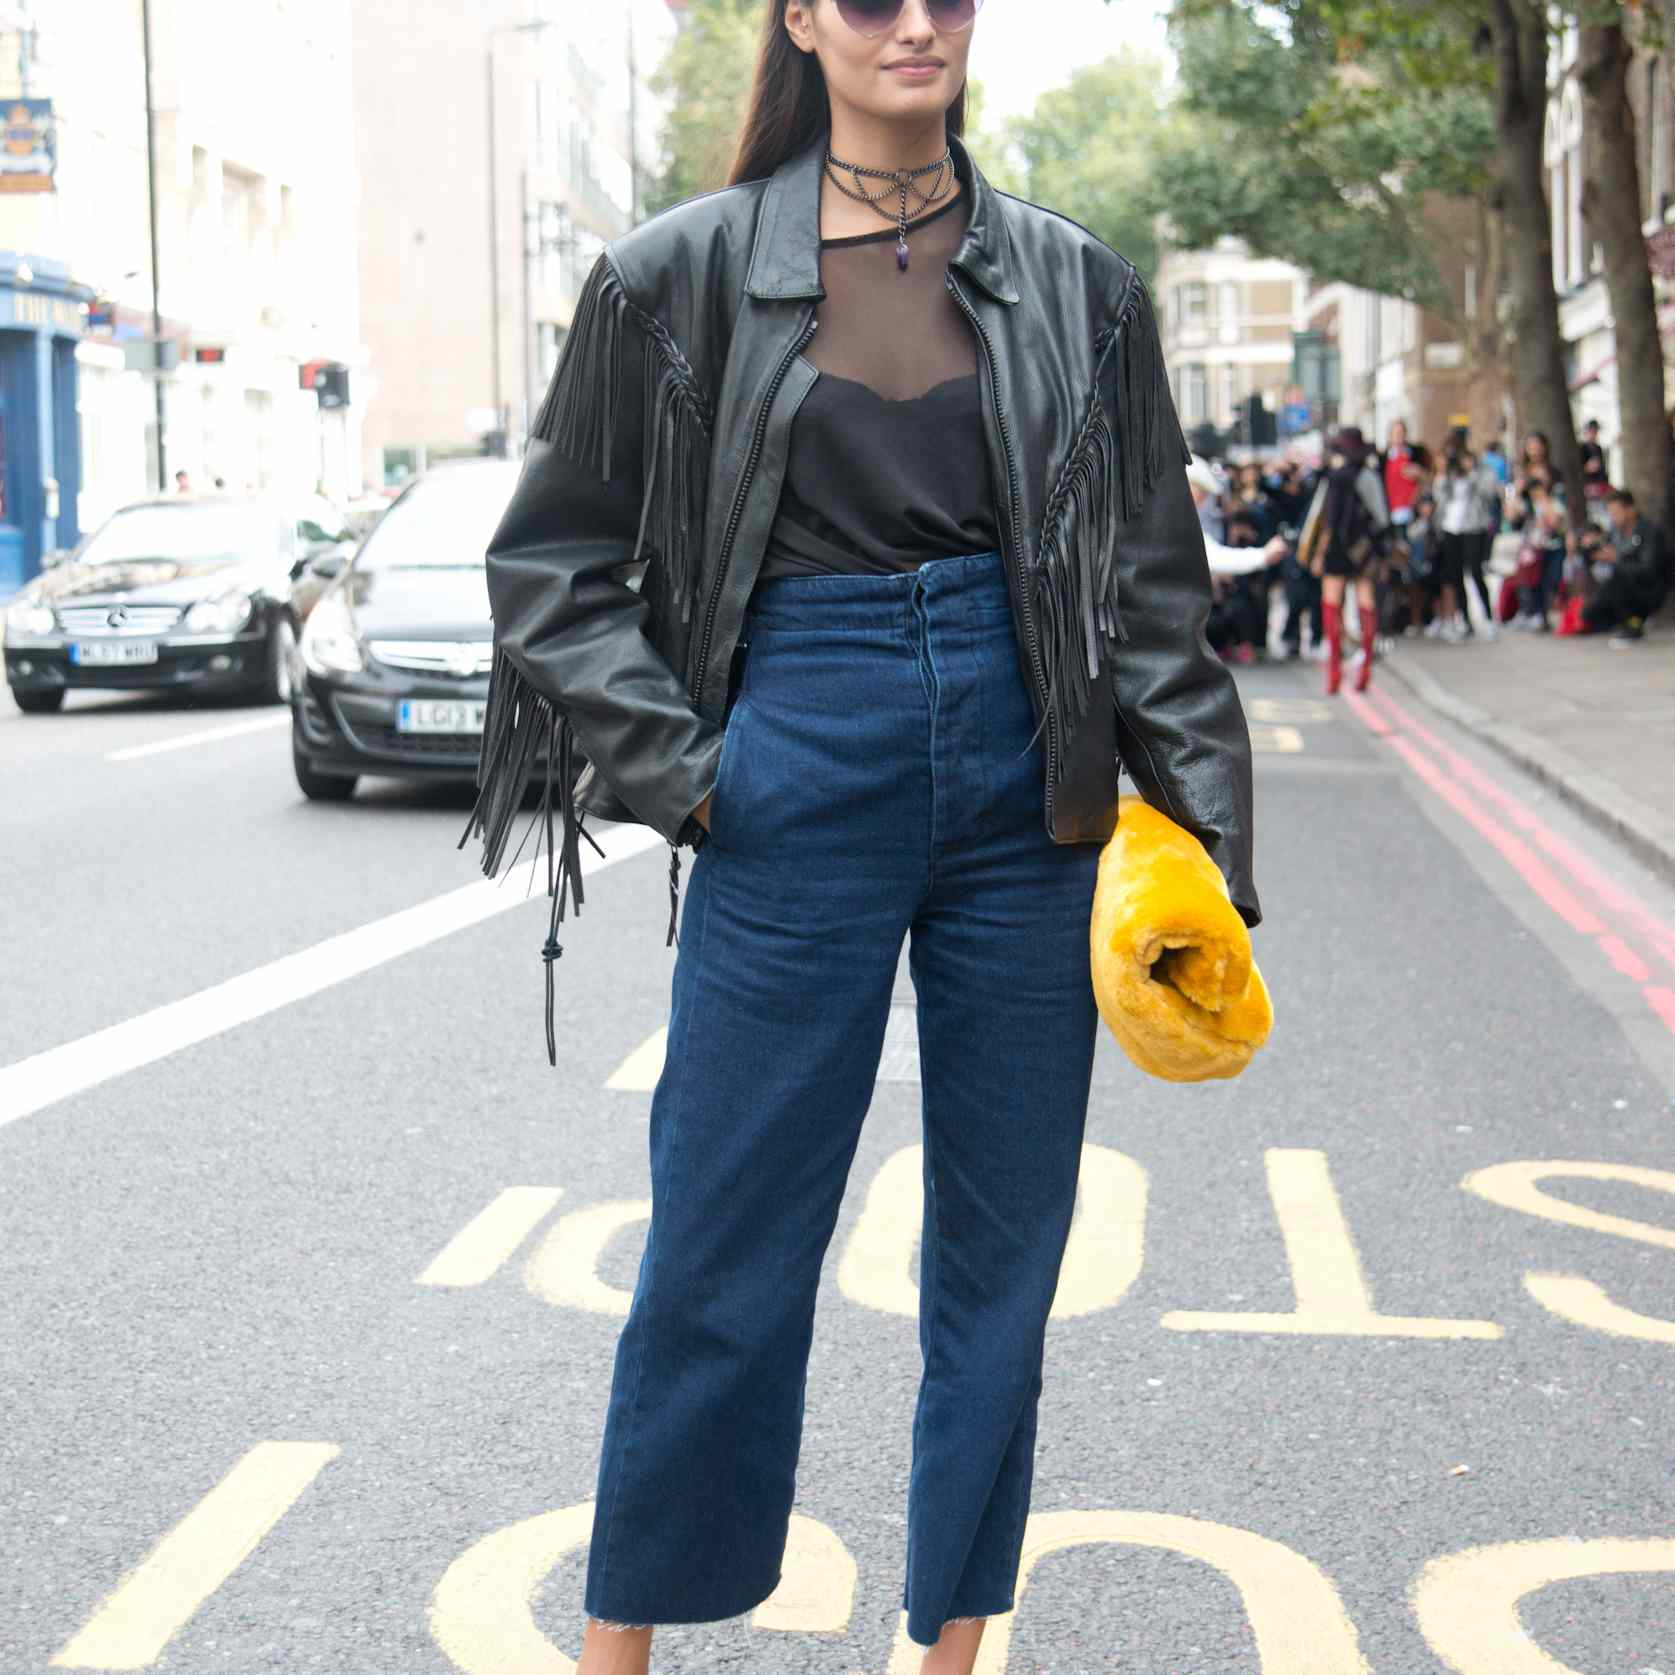 Model-Gizele-Oliveira-Asos-jeans-Kirstin-Sinclair.jpg